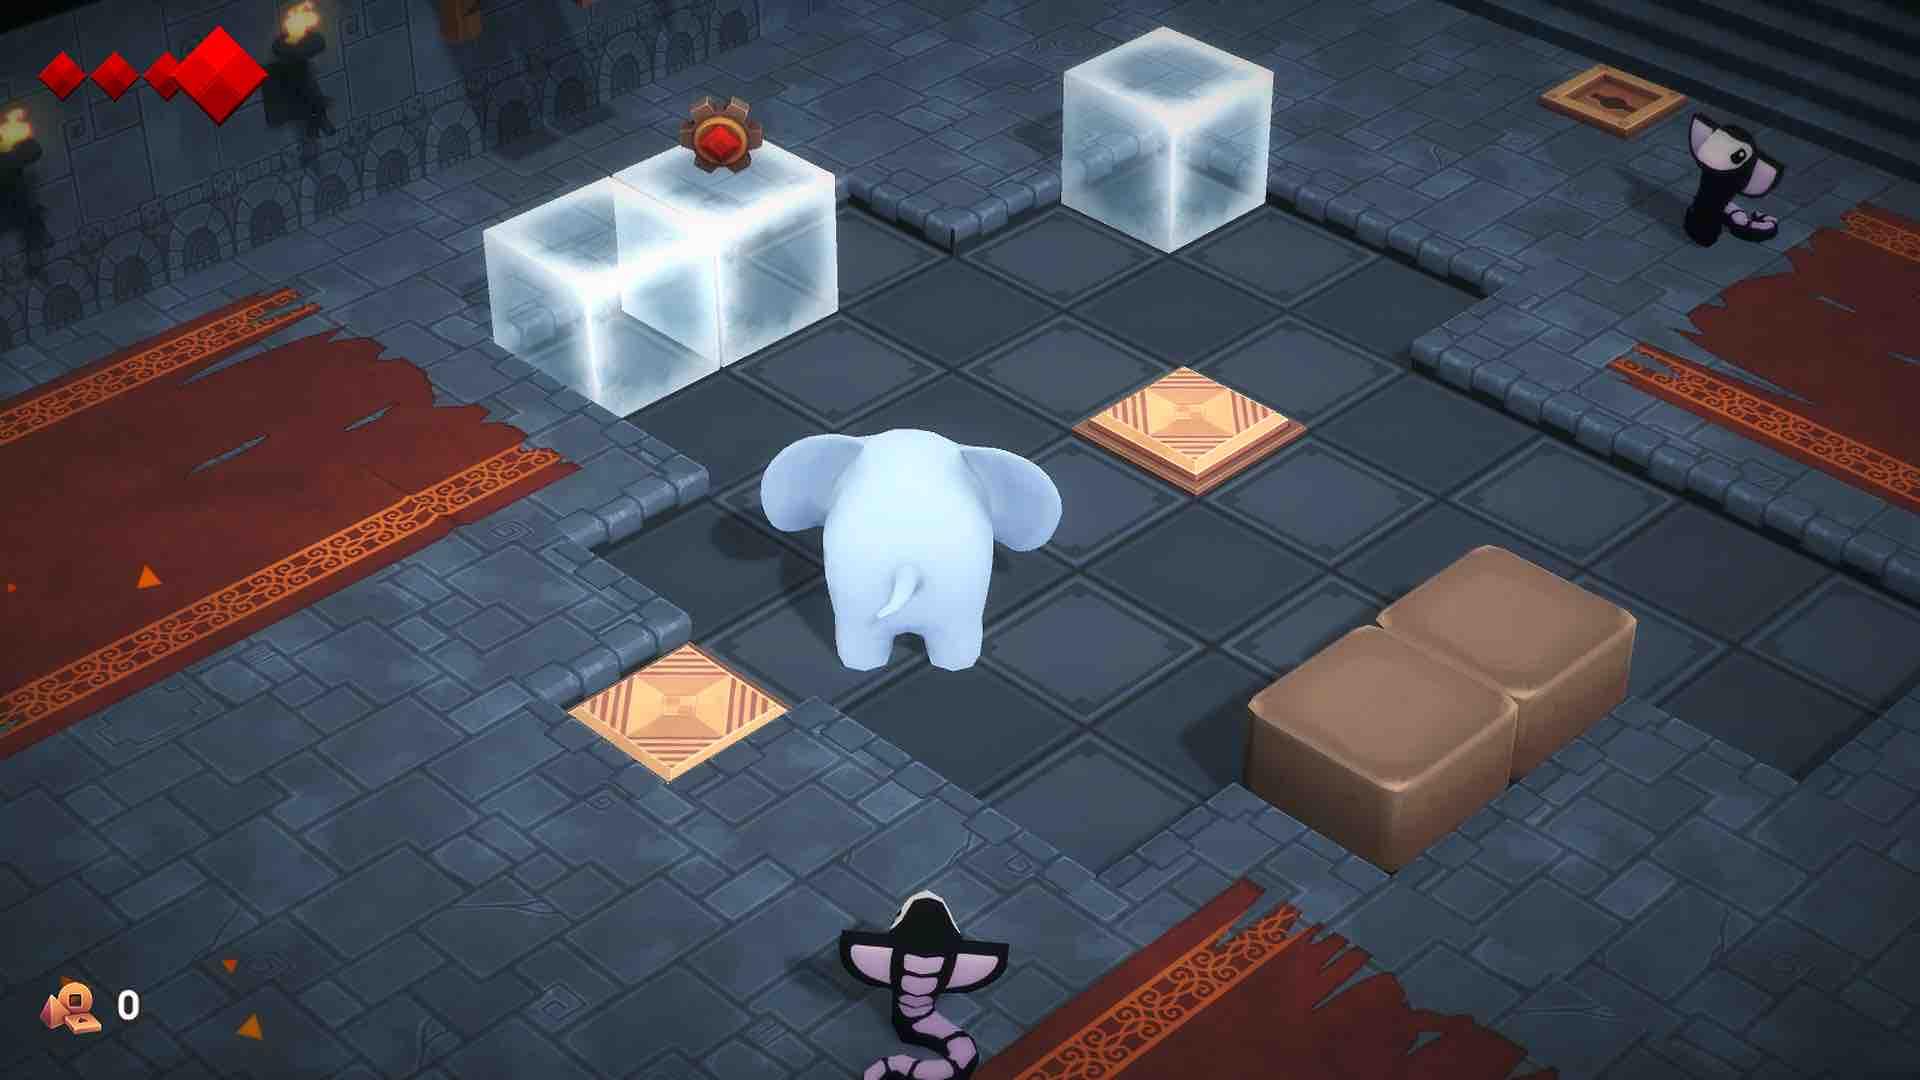 yono-and-the-celestial-elephants-screens